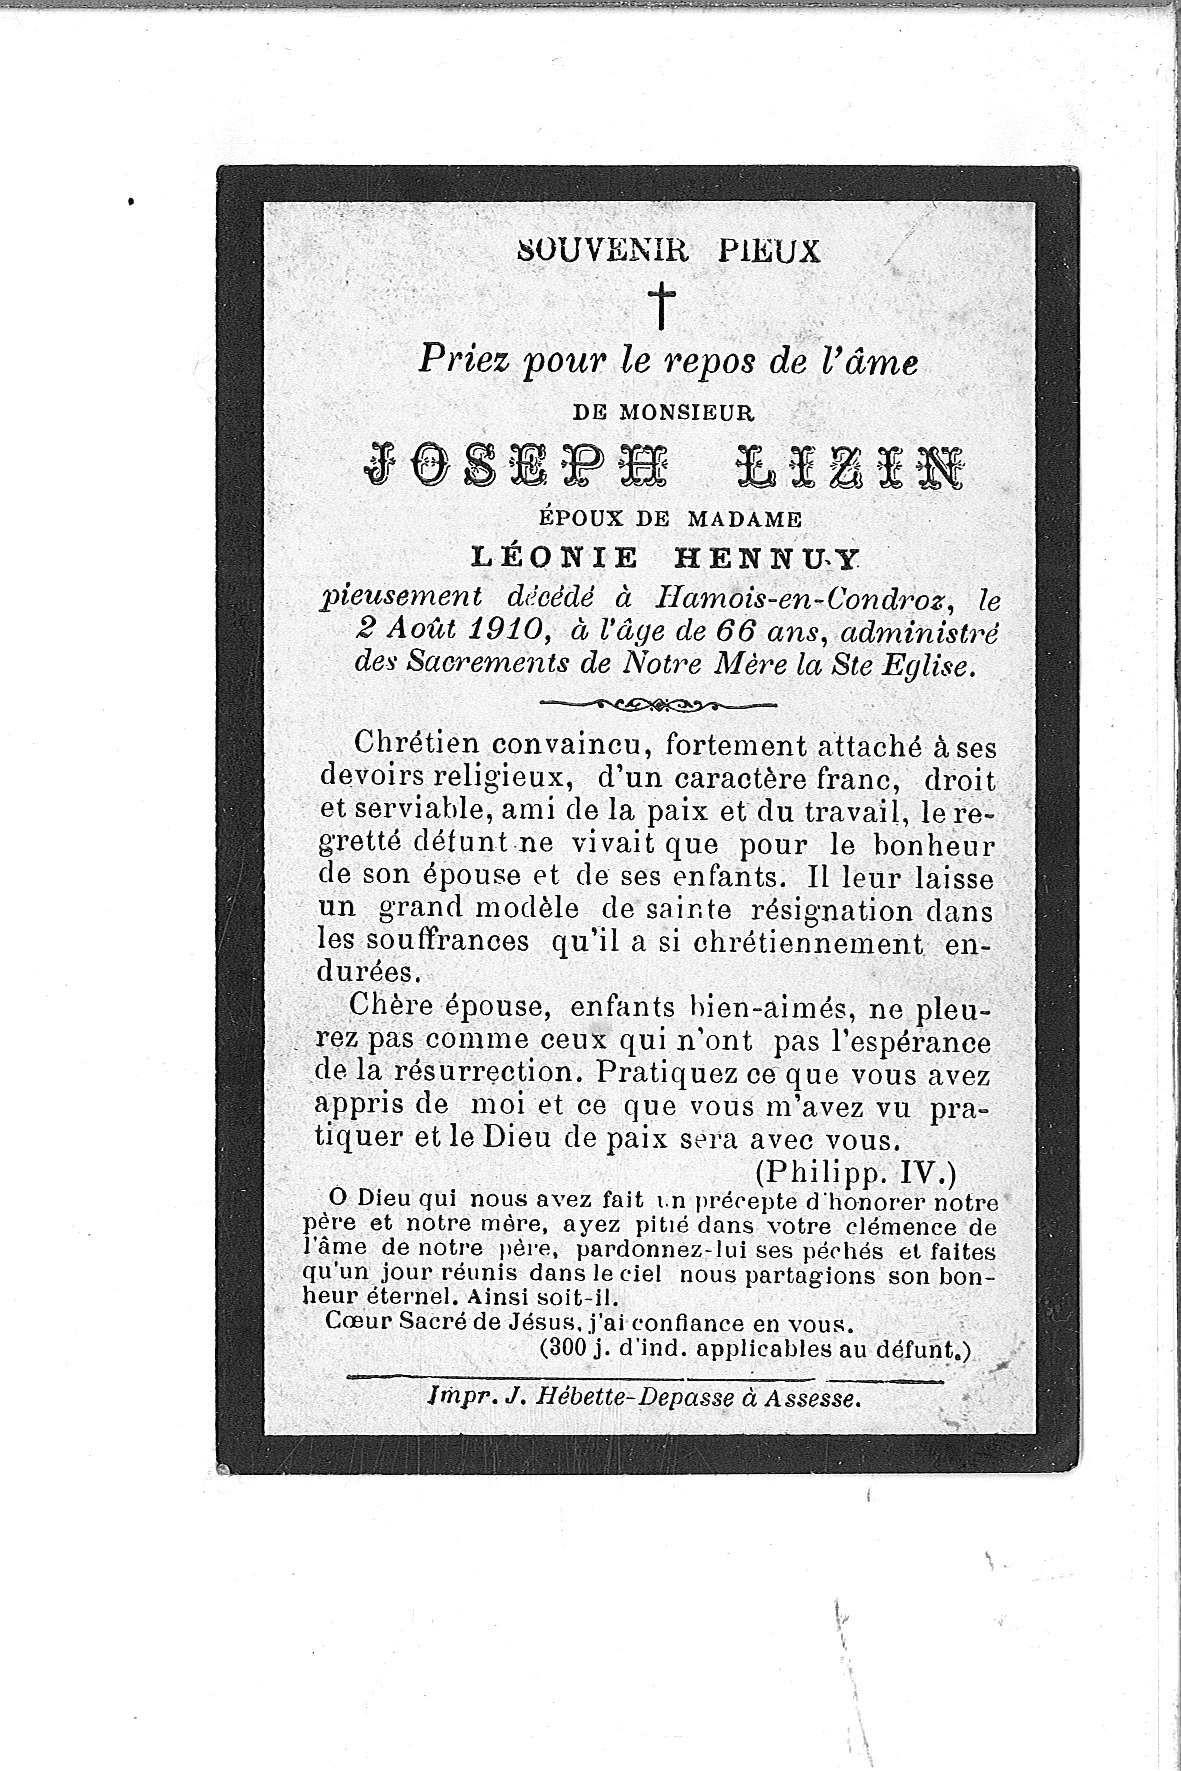 Joseph(1910)20131203145956_00016.jpg